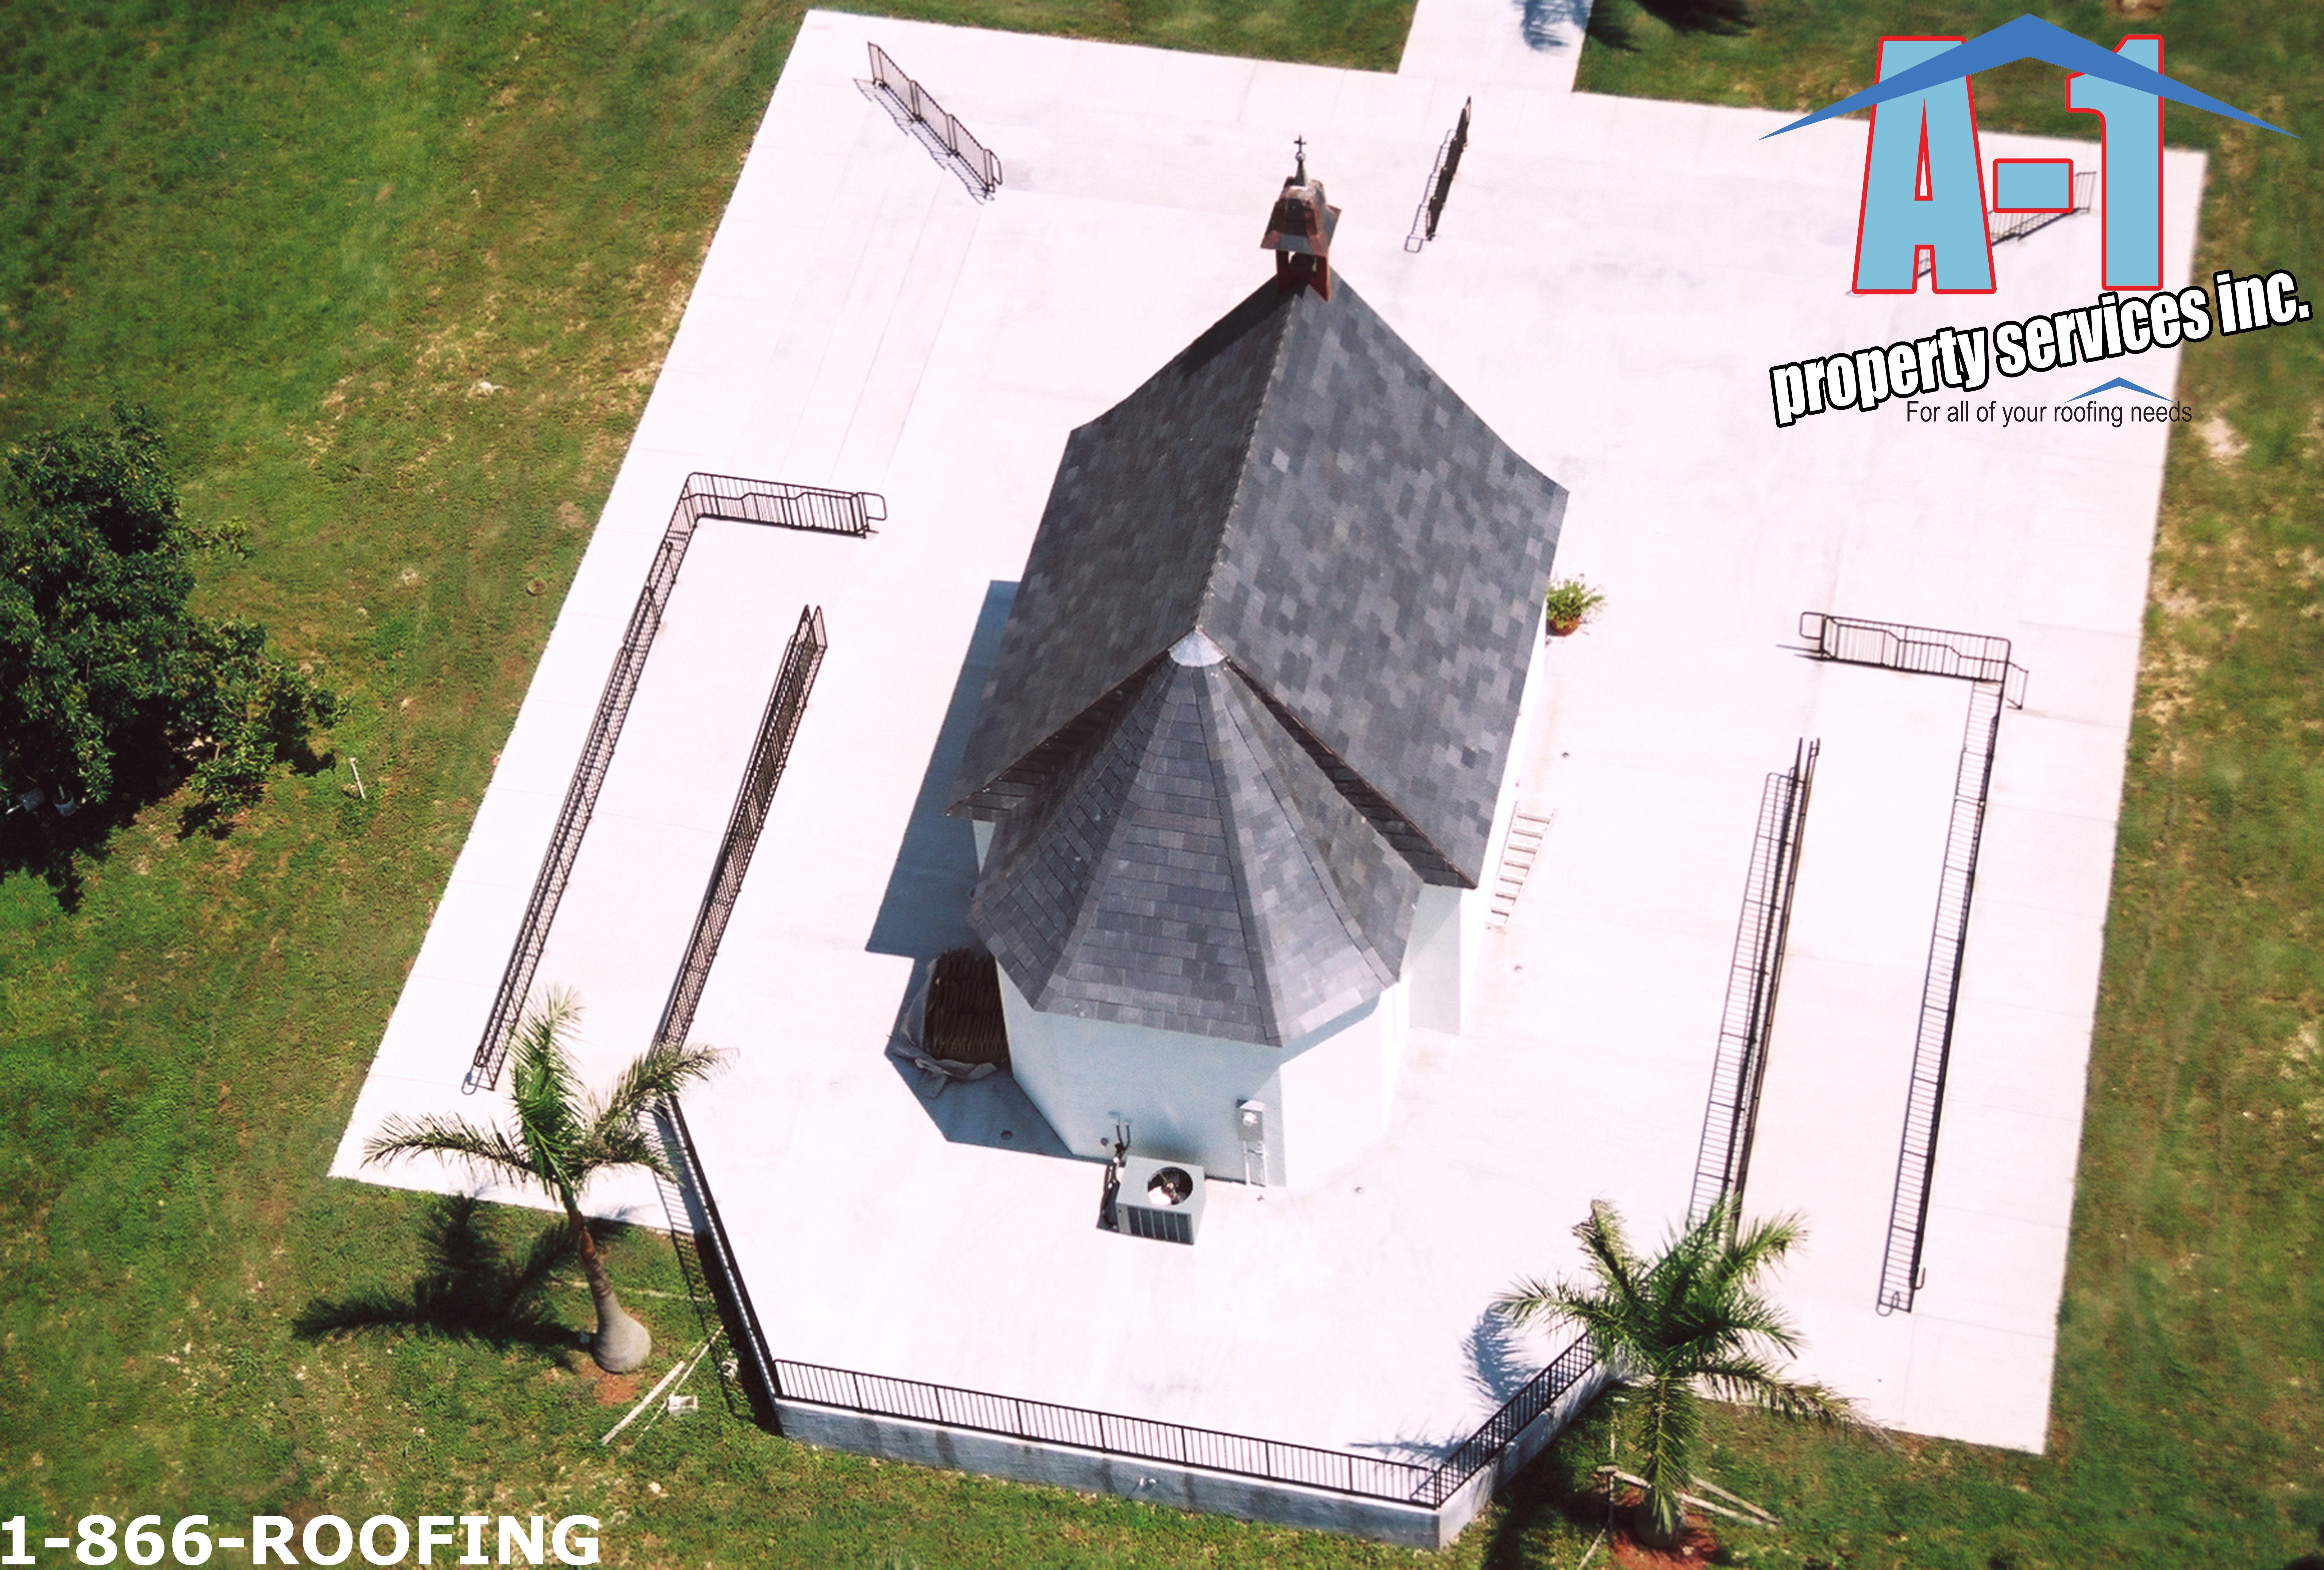 A-1 Property Services Inc